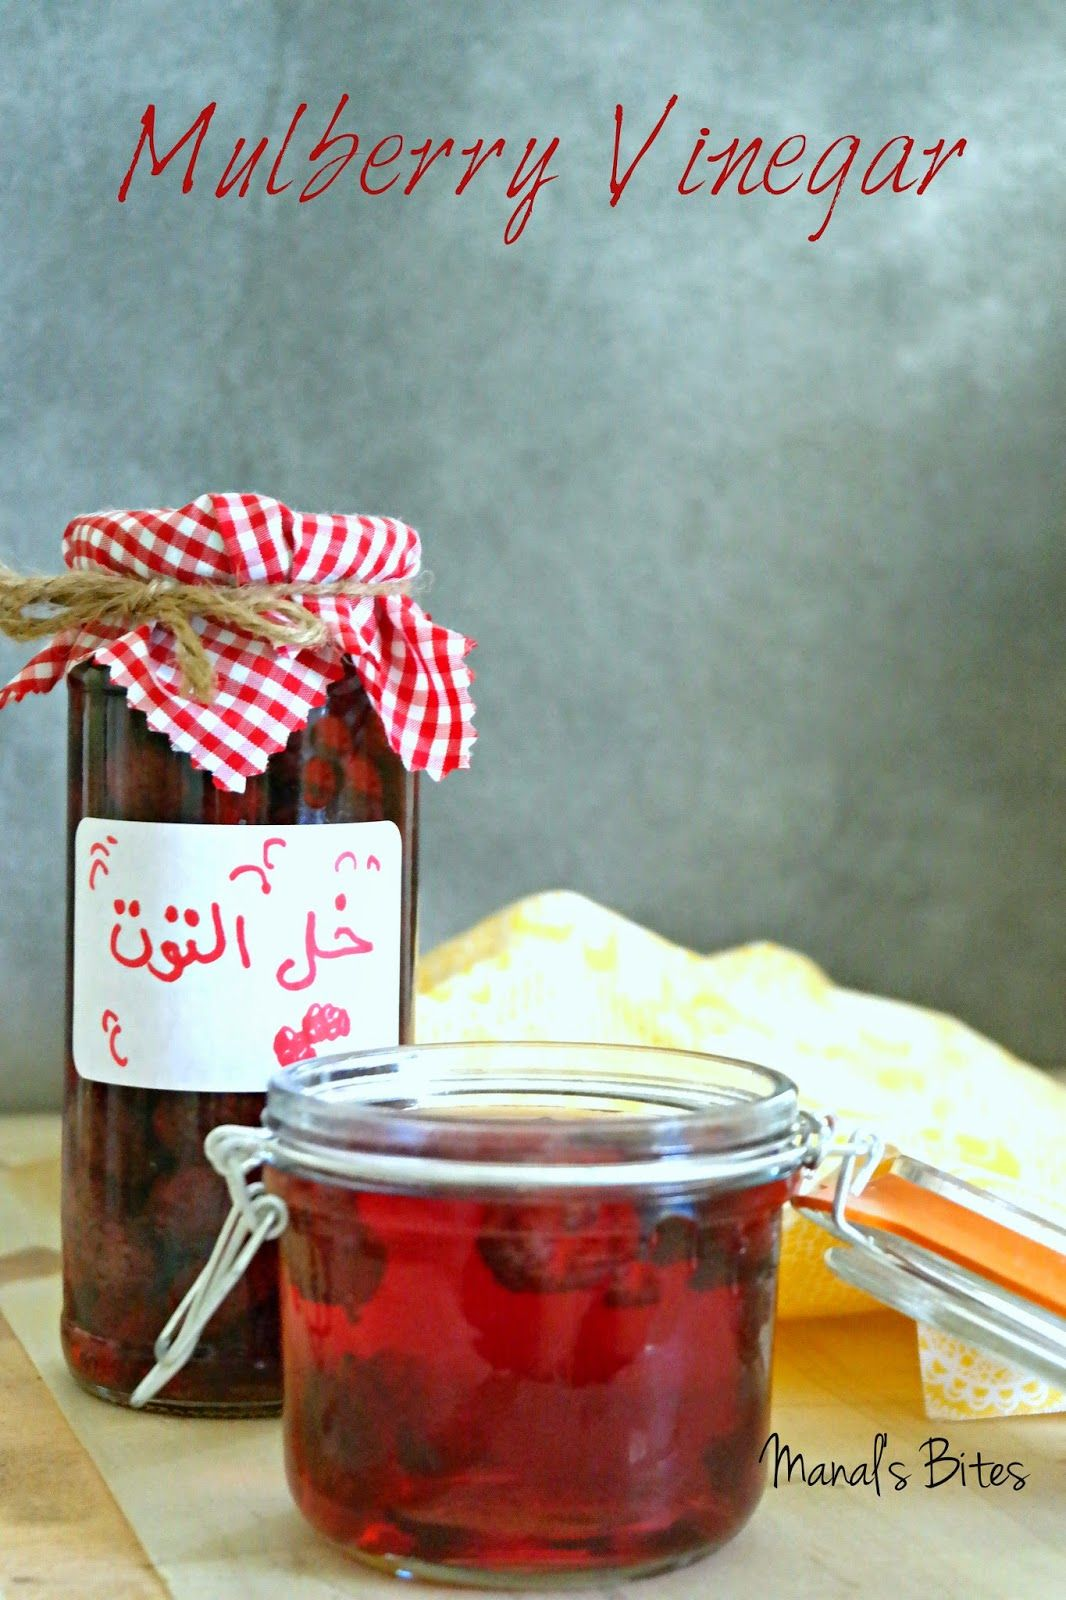 Manal S Bites وصفات الاربعاء من دنيا يا دنيا على قناة رؤيا وخل التوت المنزلي How To Make Mulberry Vinegar Middle Eastern Sweets Homemade Recipes Food